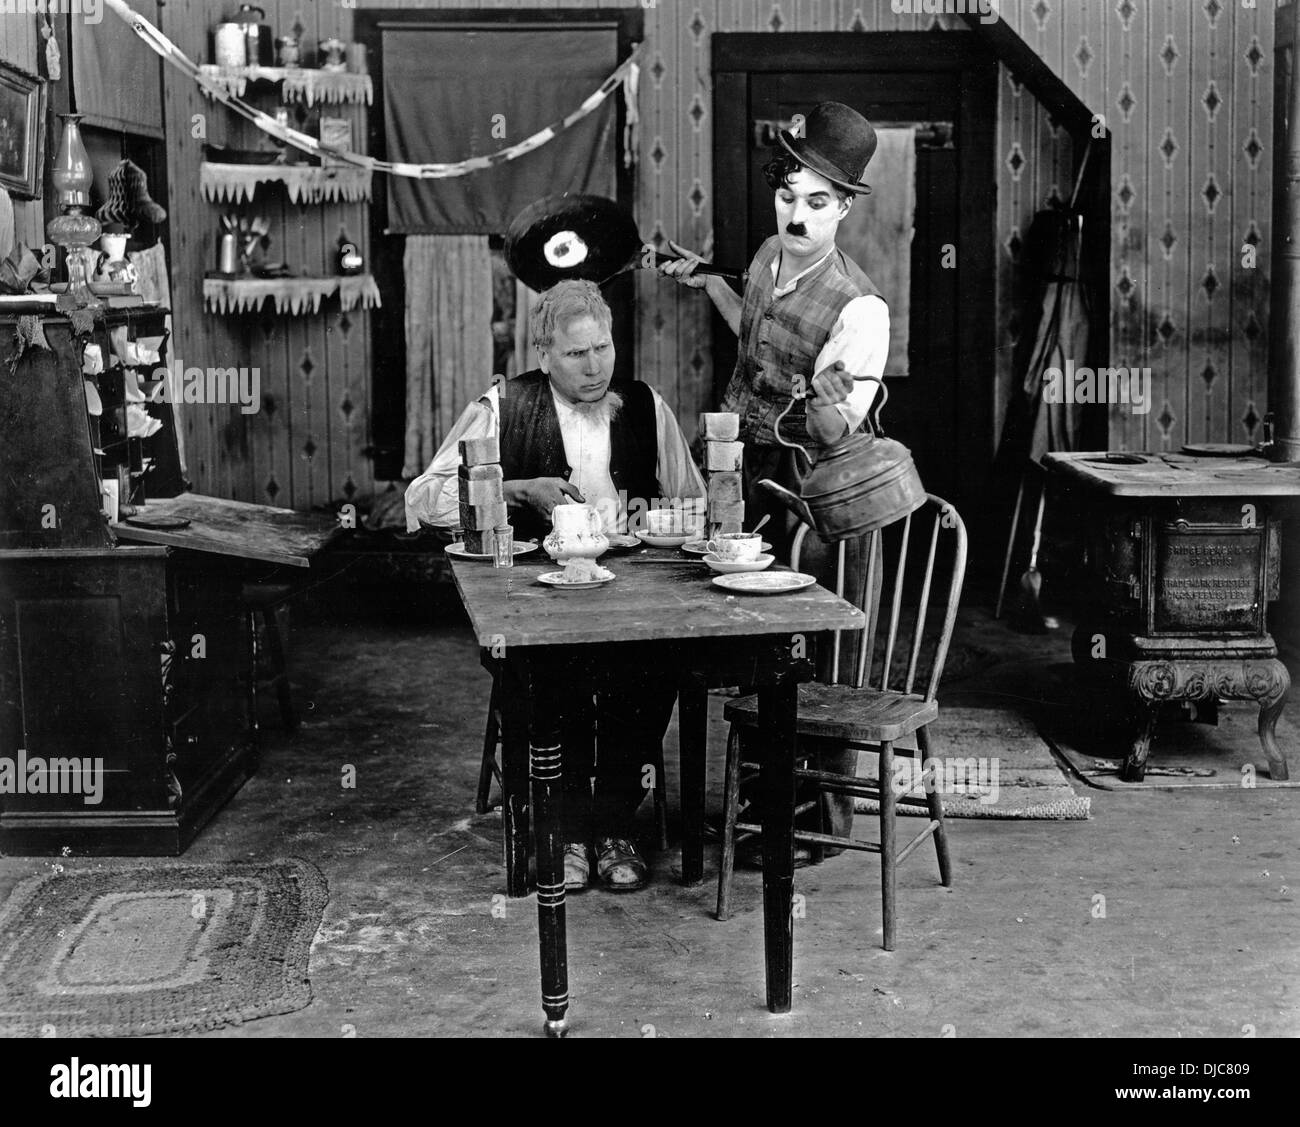 Charlie Chaplin and Tom Wilson on-set of the Film, Sunnyside, 1919 - Stock Image